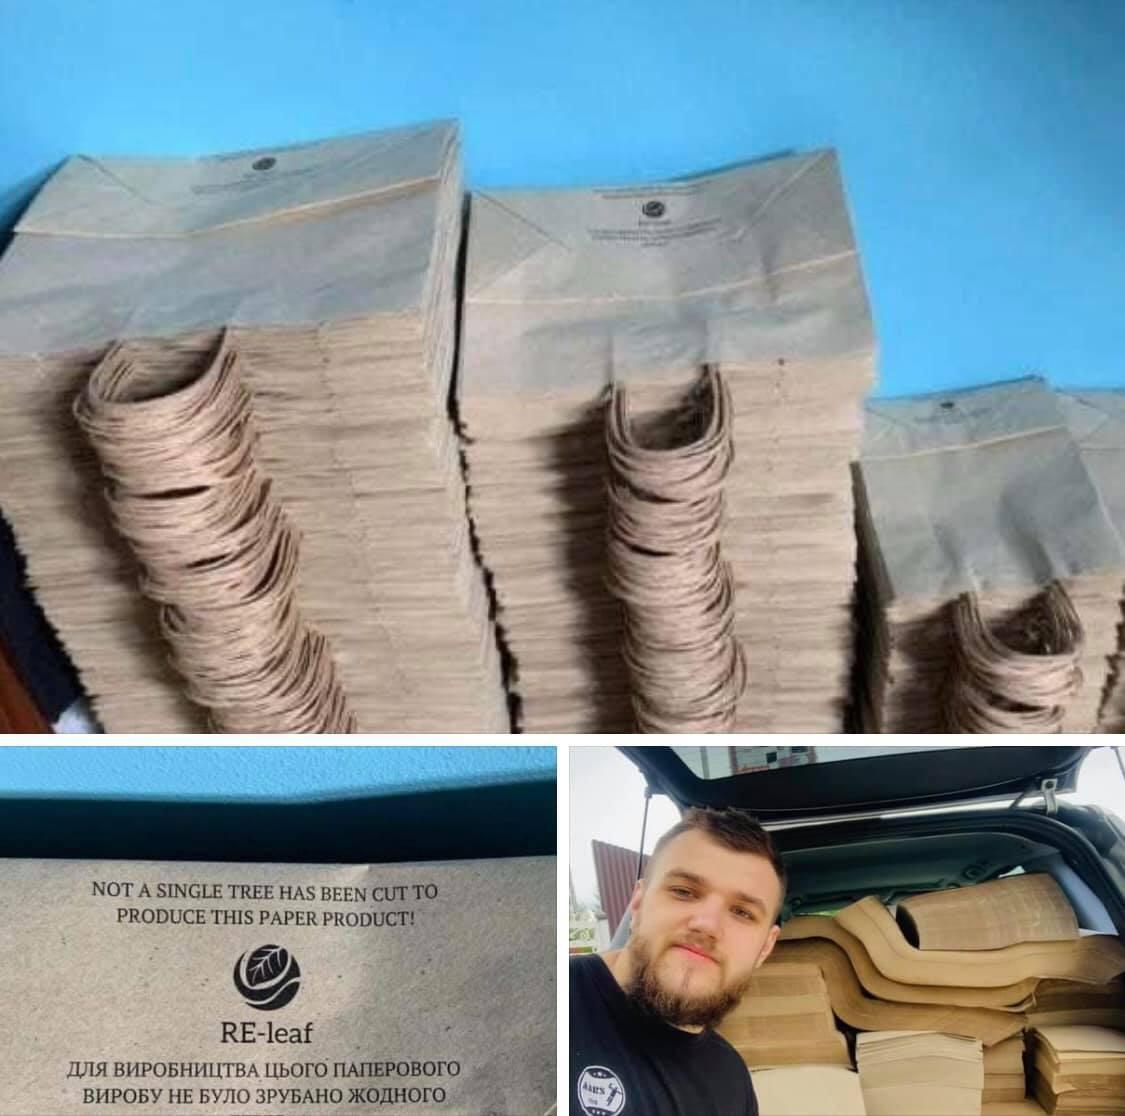 Екологічна паперова продукція Re-leaf